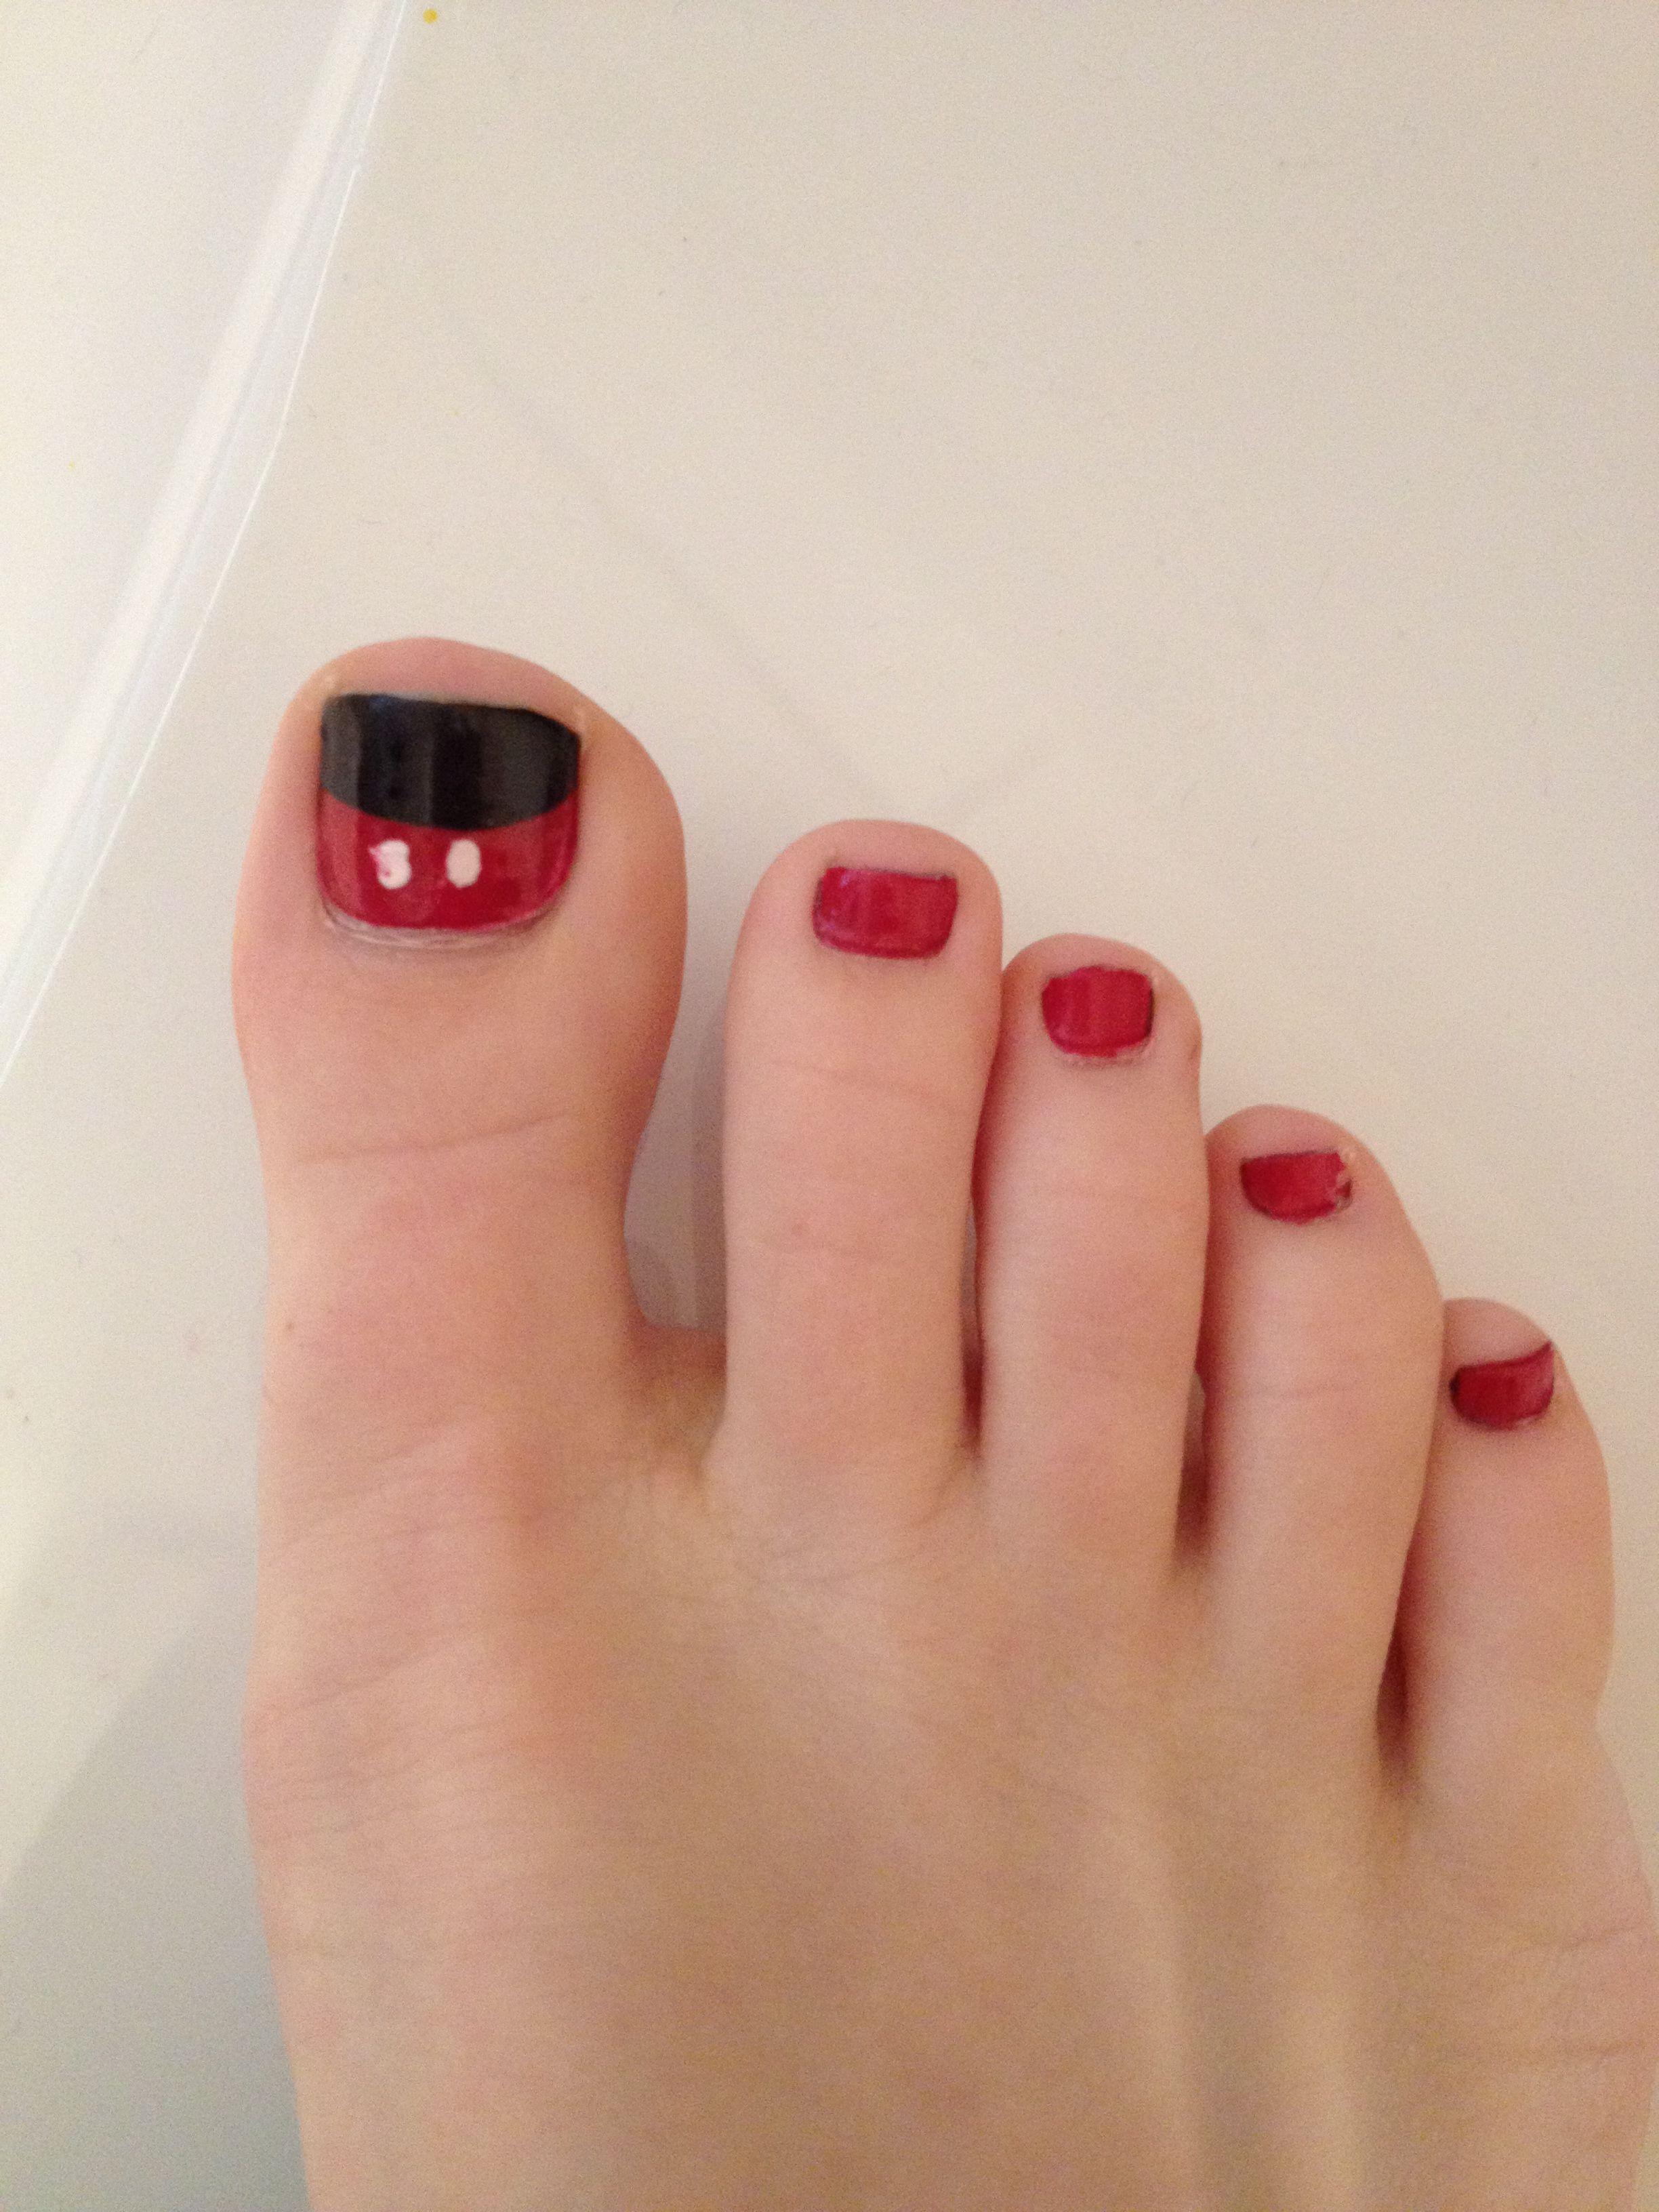 Mickey Mouse toenails | Nails | Pinterest